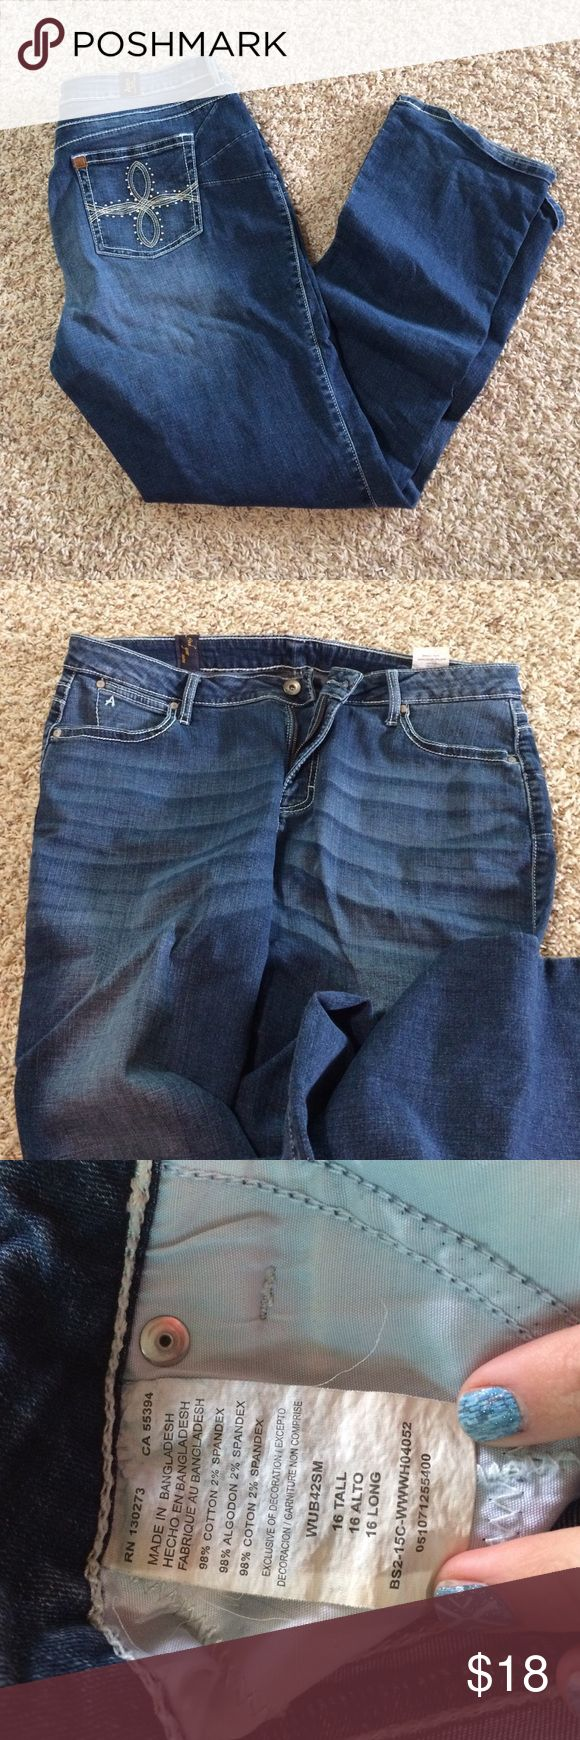 Aura women's jeans Aura by wrangler jeans. 16 tall Wrangler Pants Boot Cut & Flare